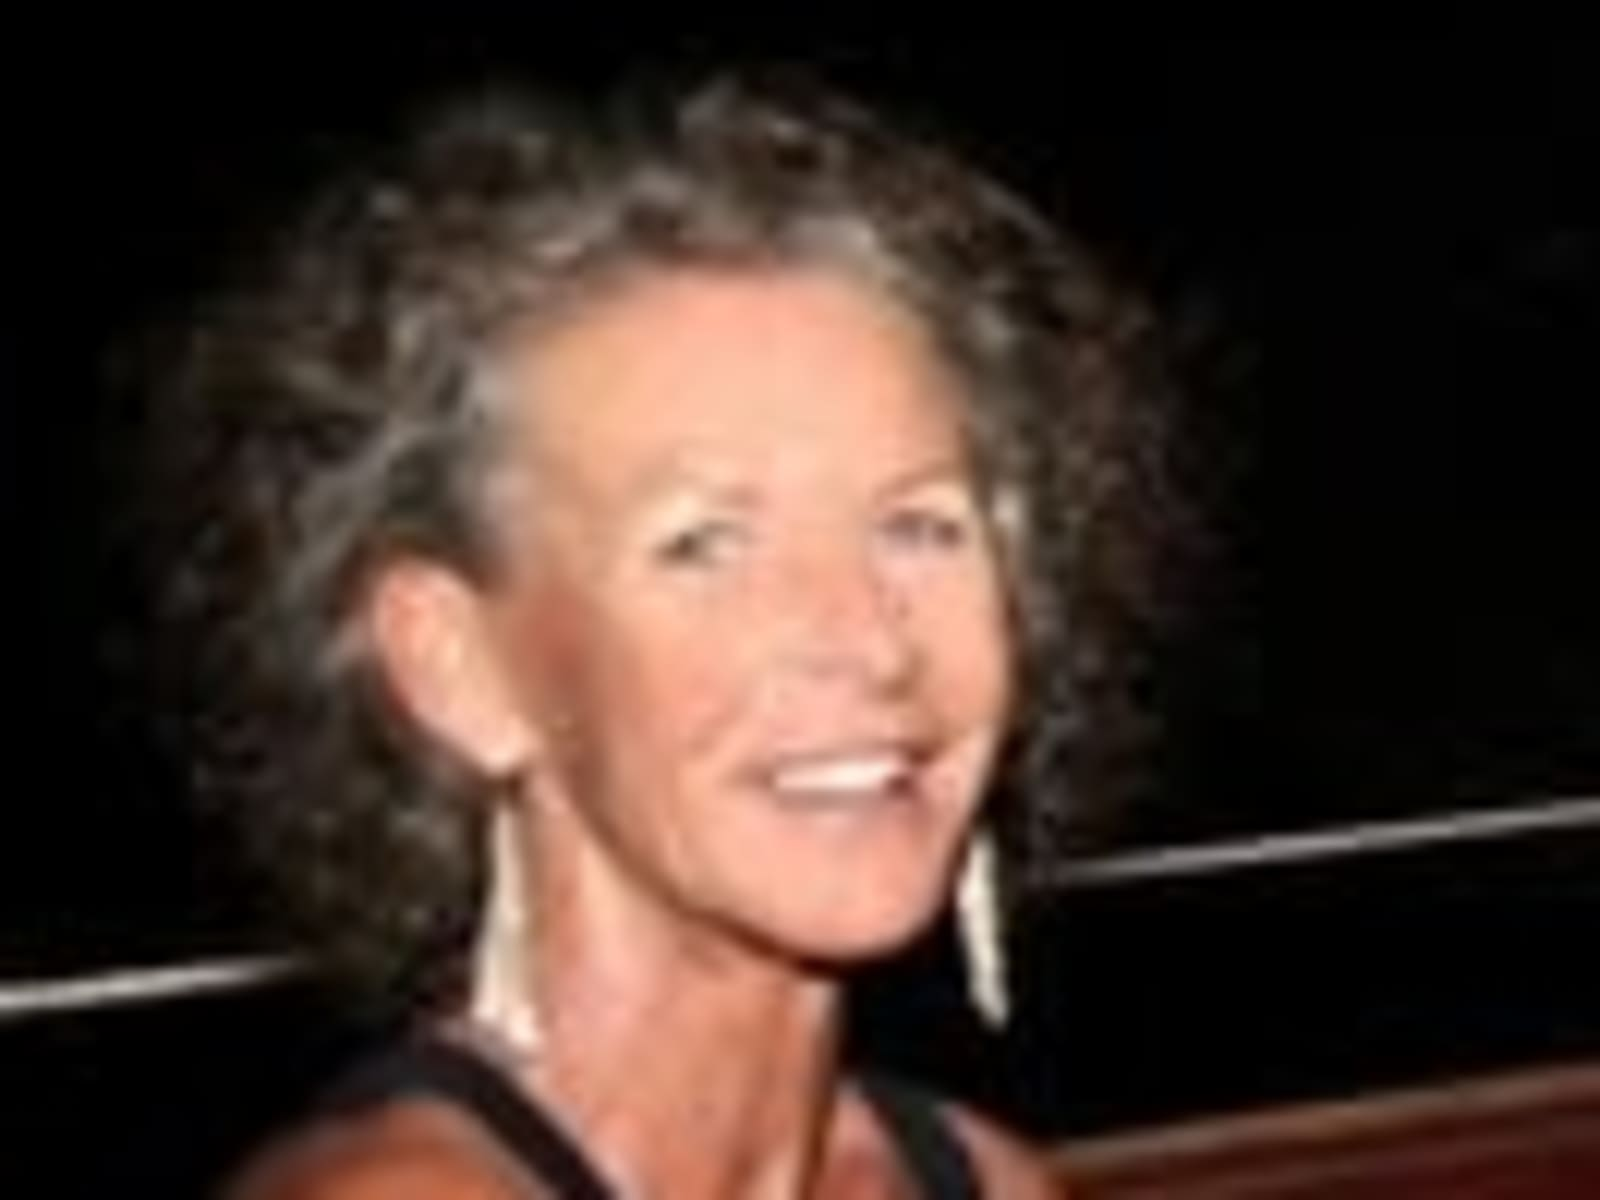 Gail from Port Douglas, Queensland, Australia